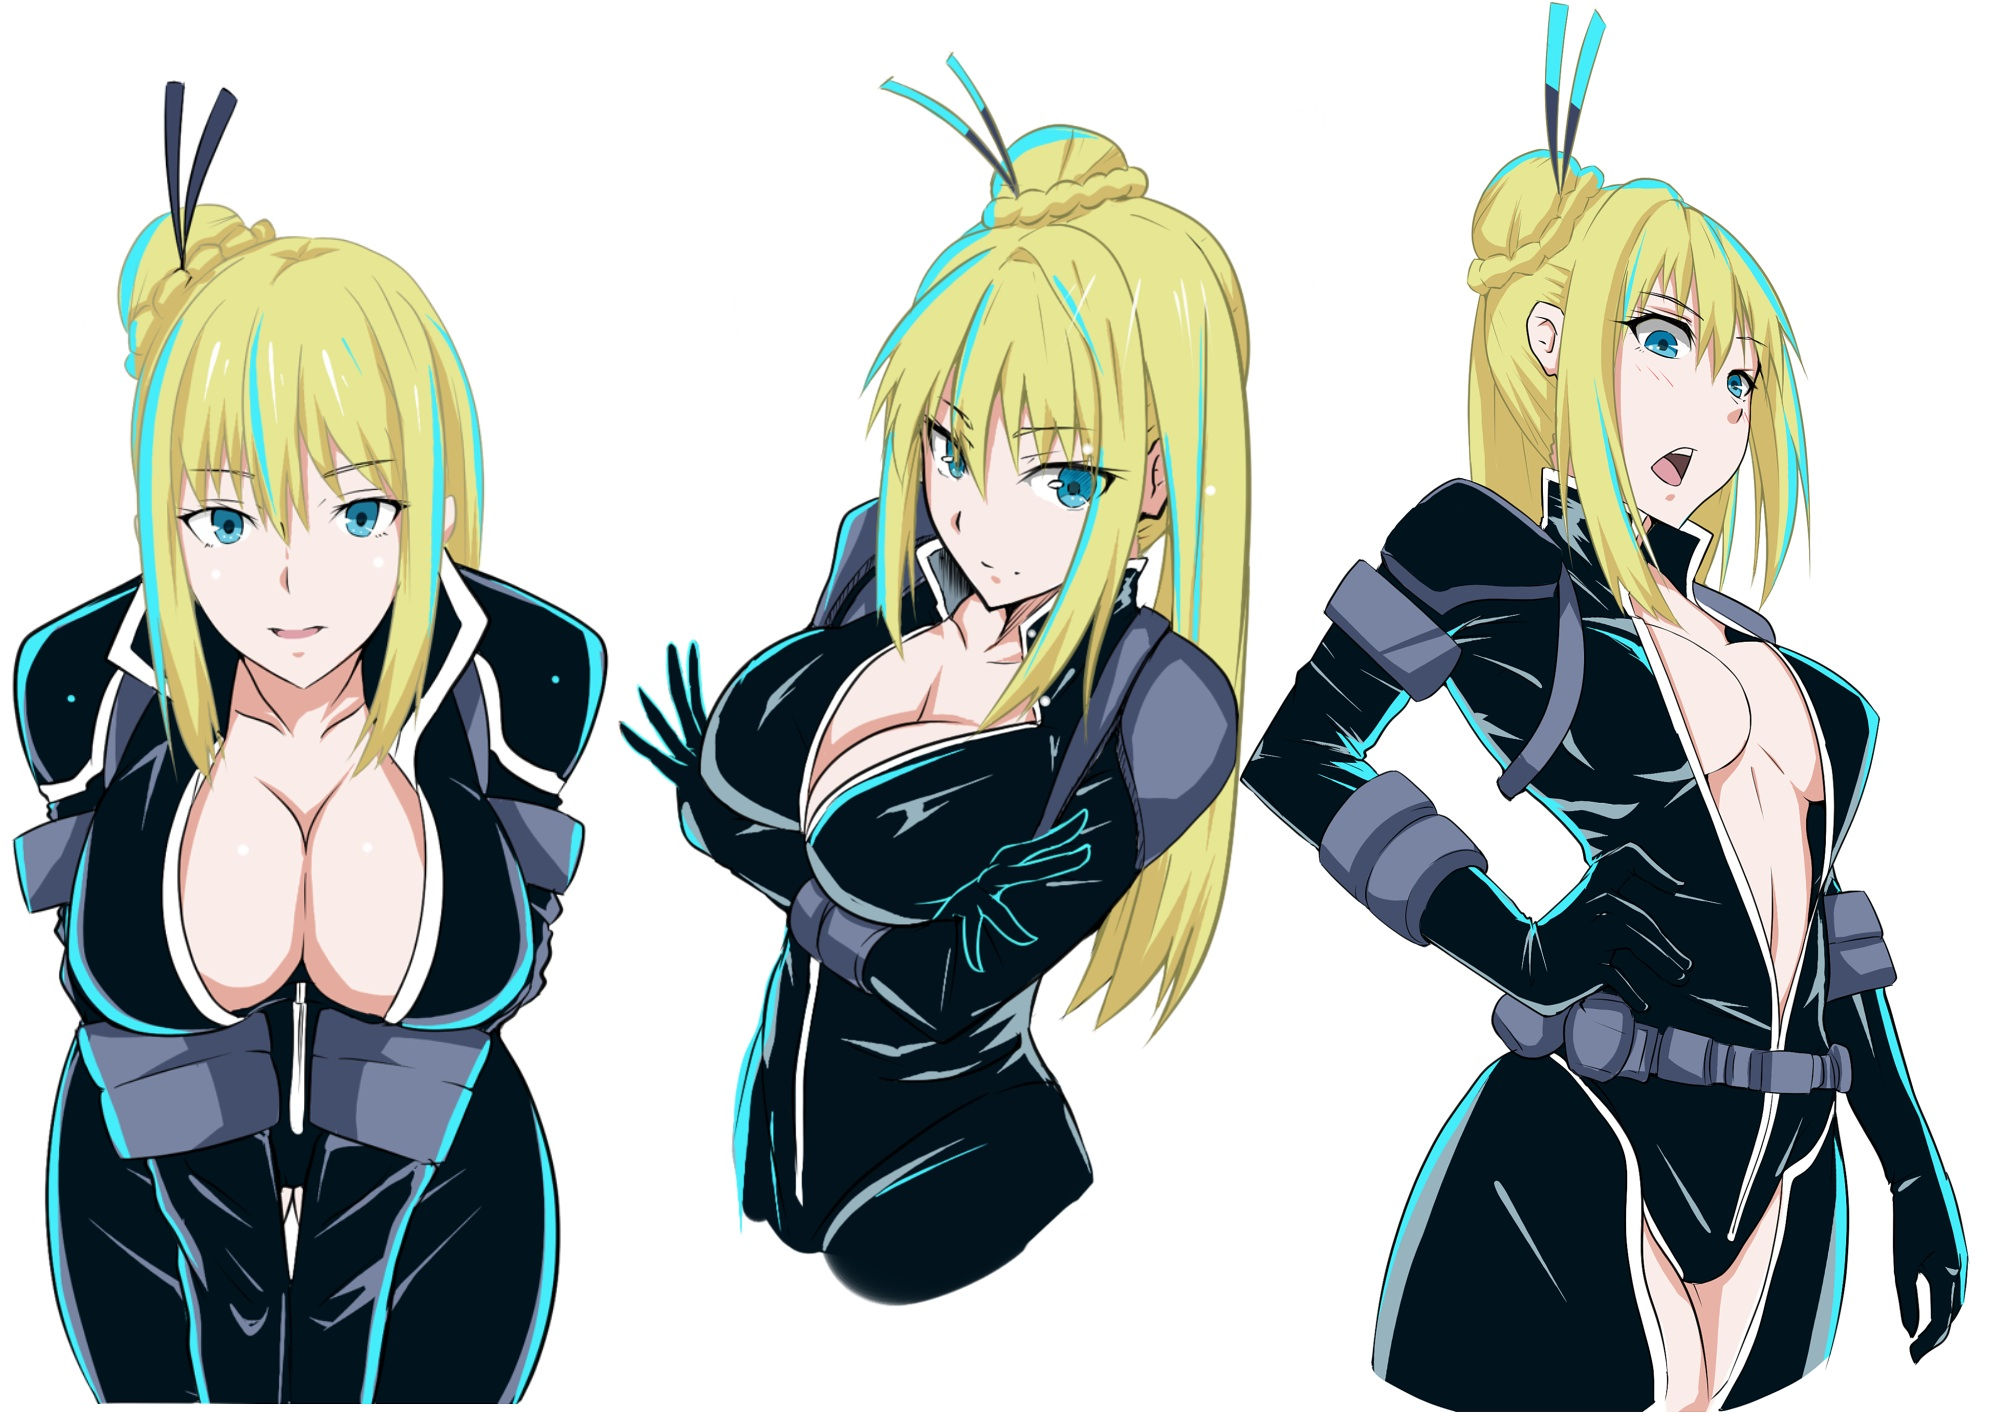 ninja-4079152-50897648_p0.jpg